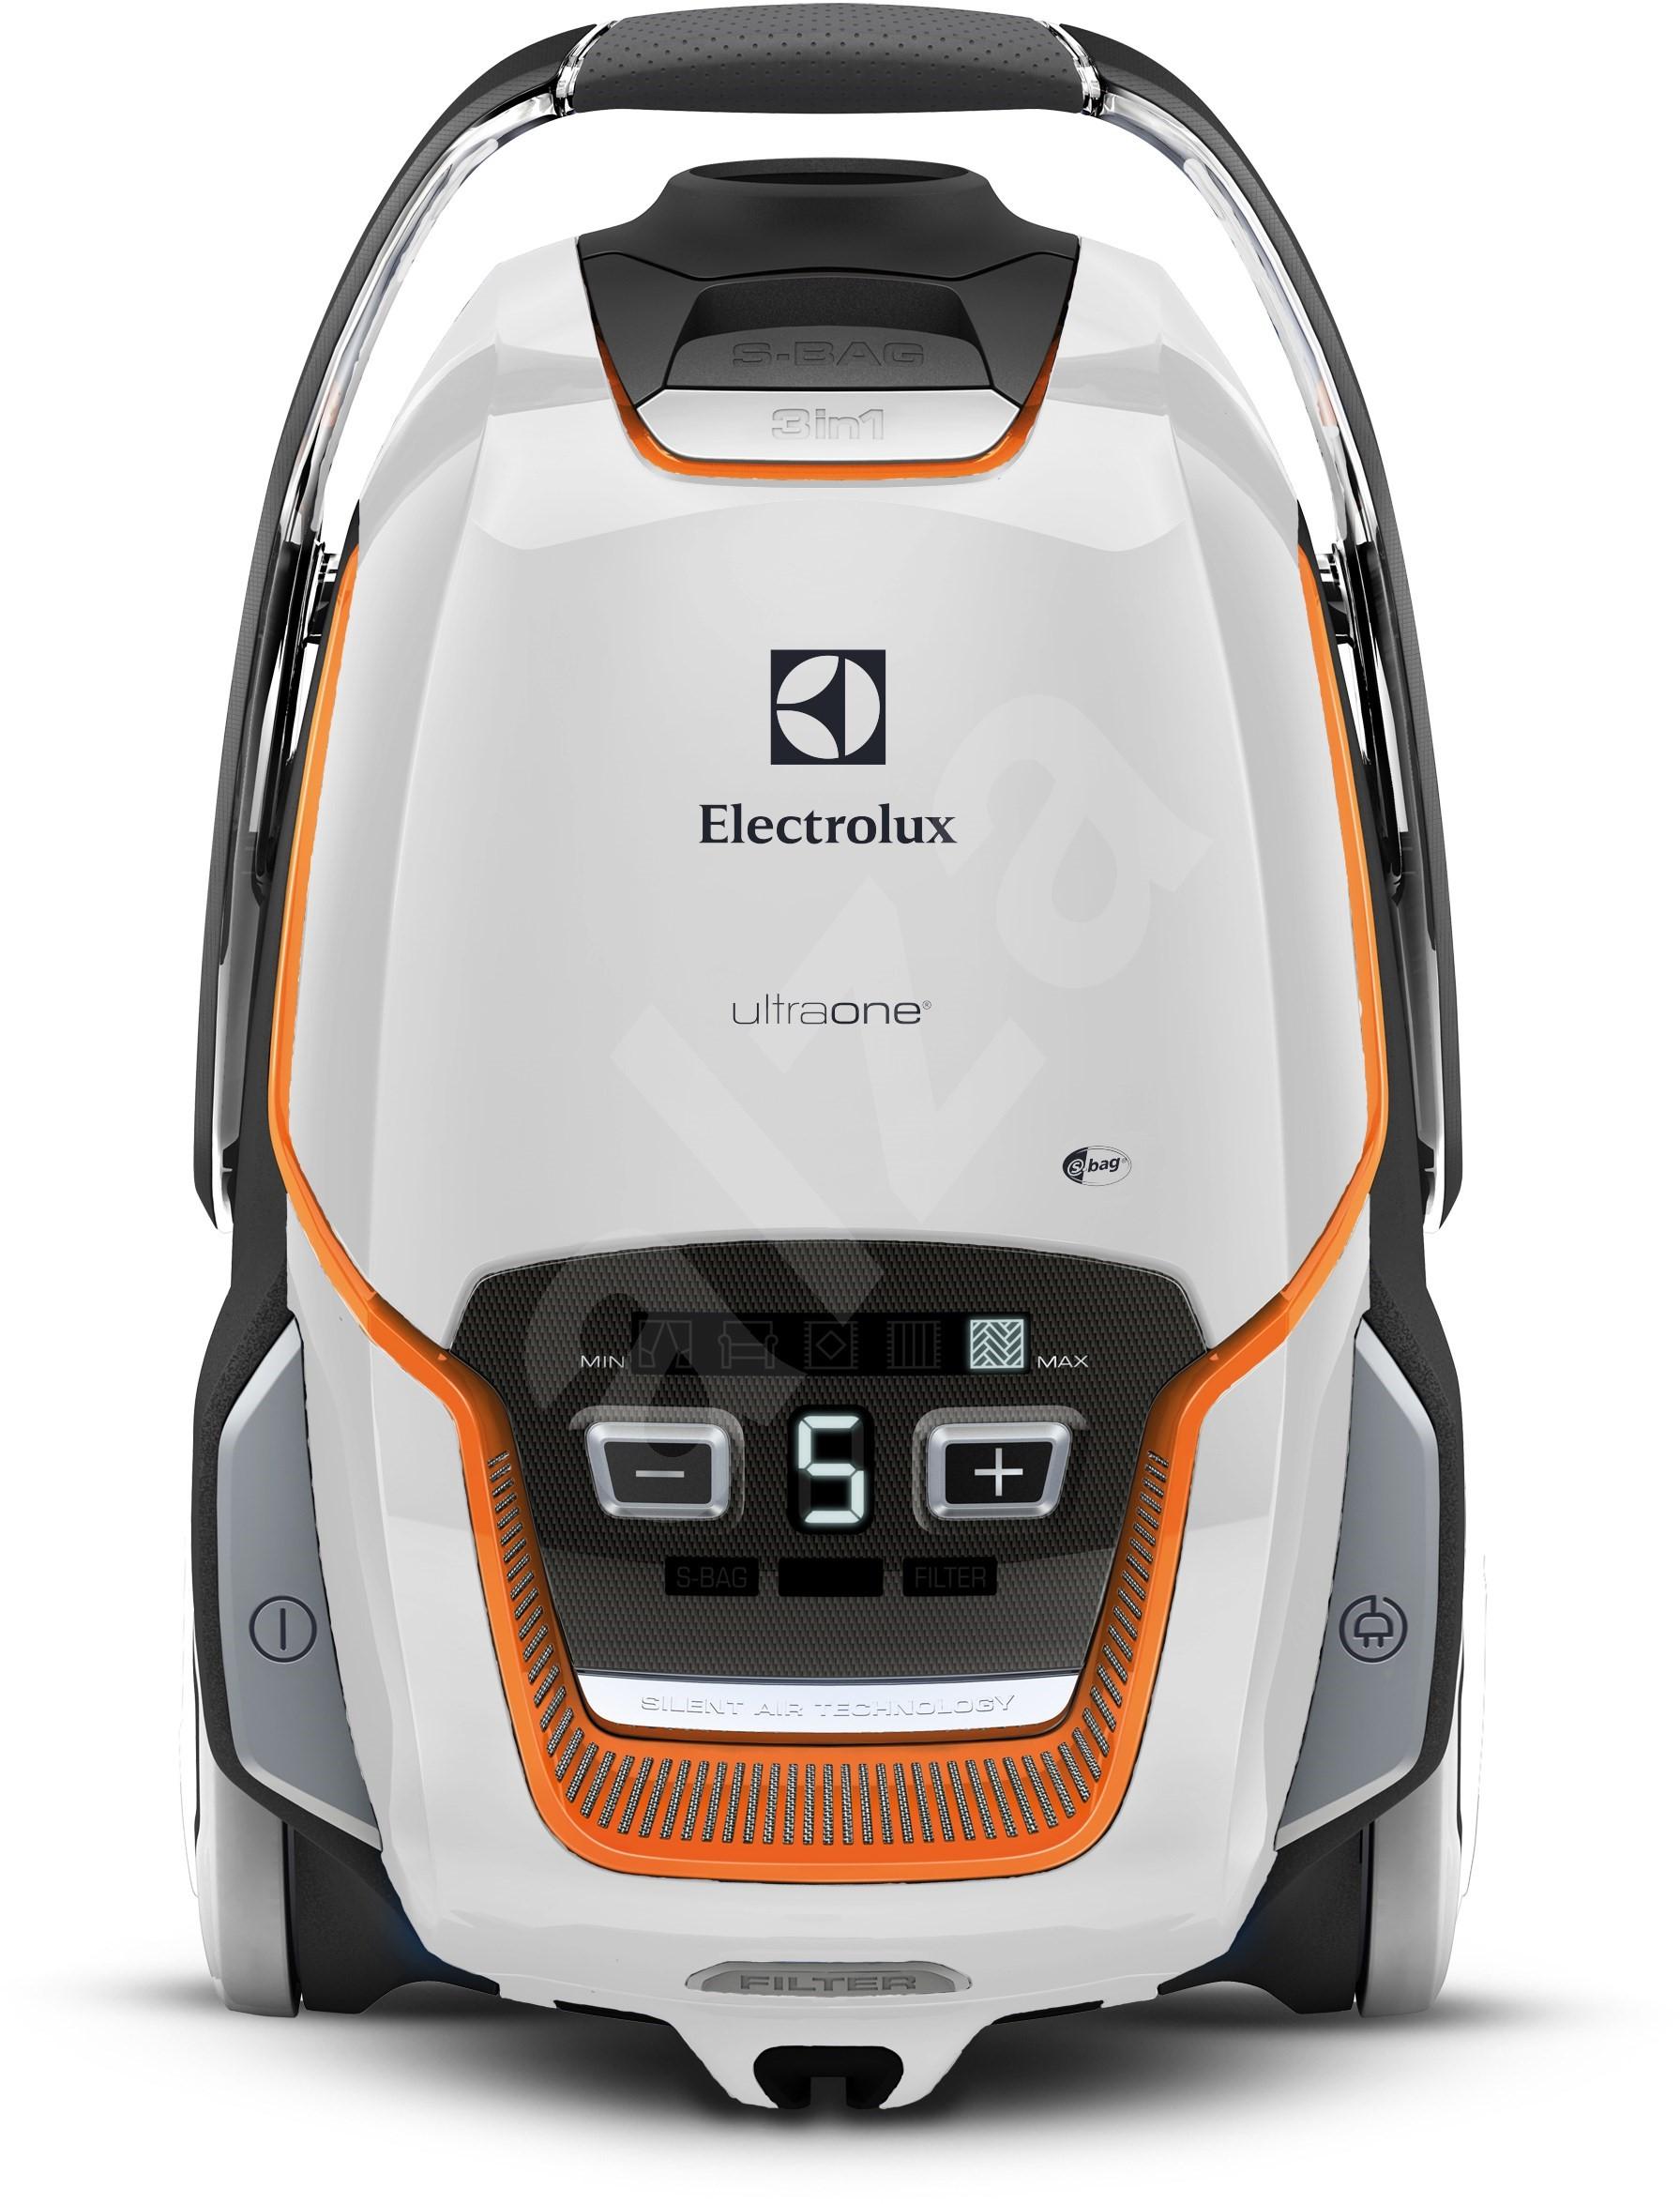 Electrolux UltraOne ZUOANIMAL + - bag vacuum cleaner | Alzashop.com